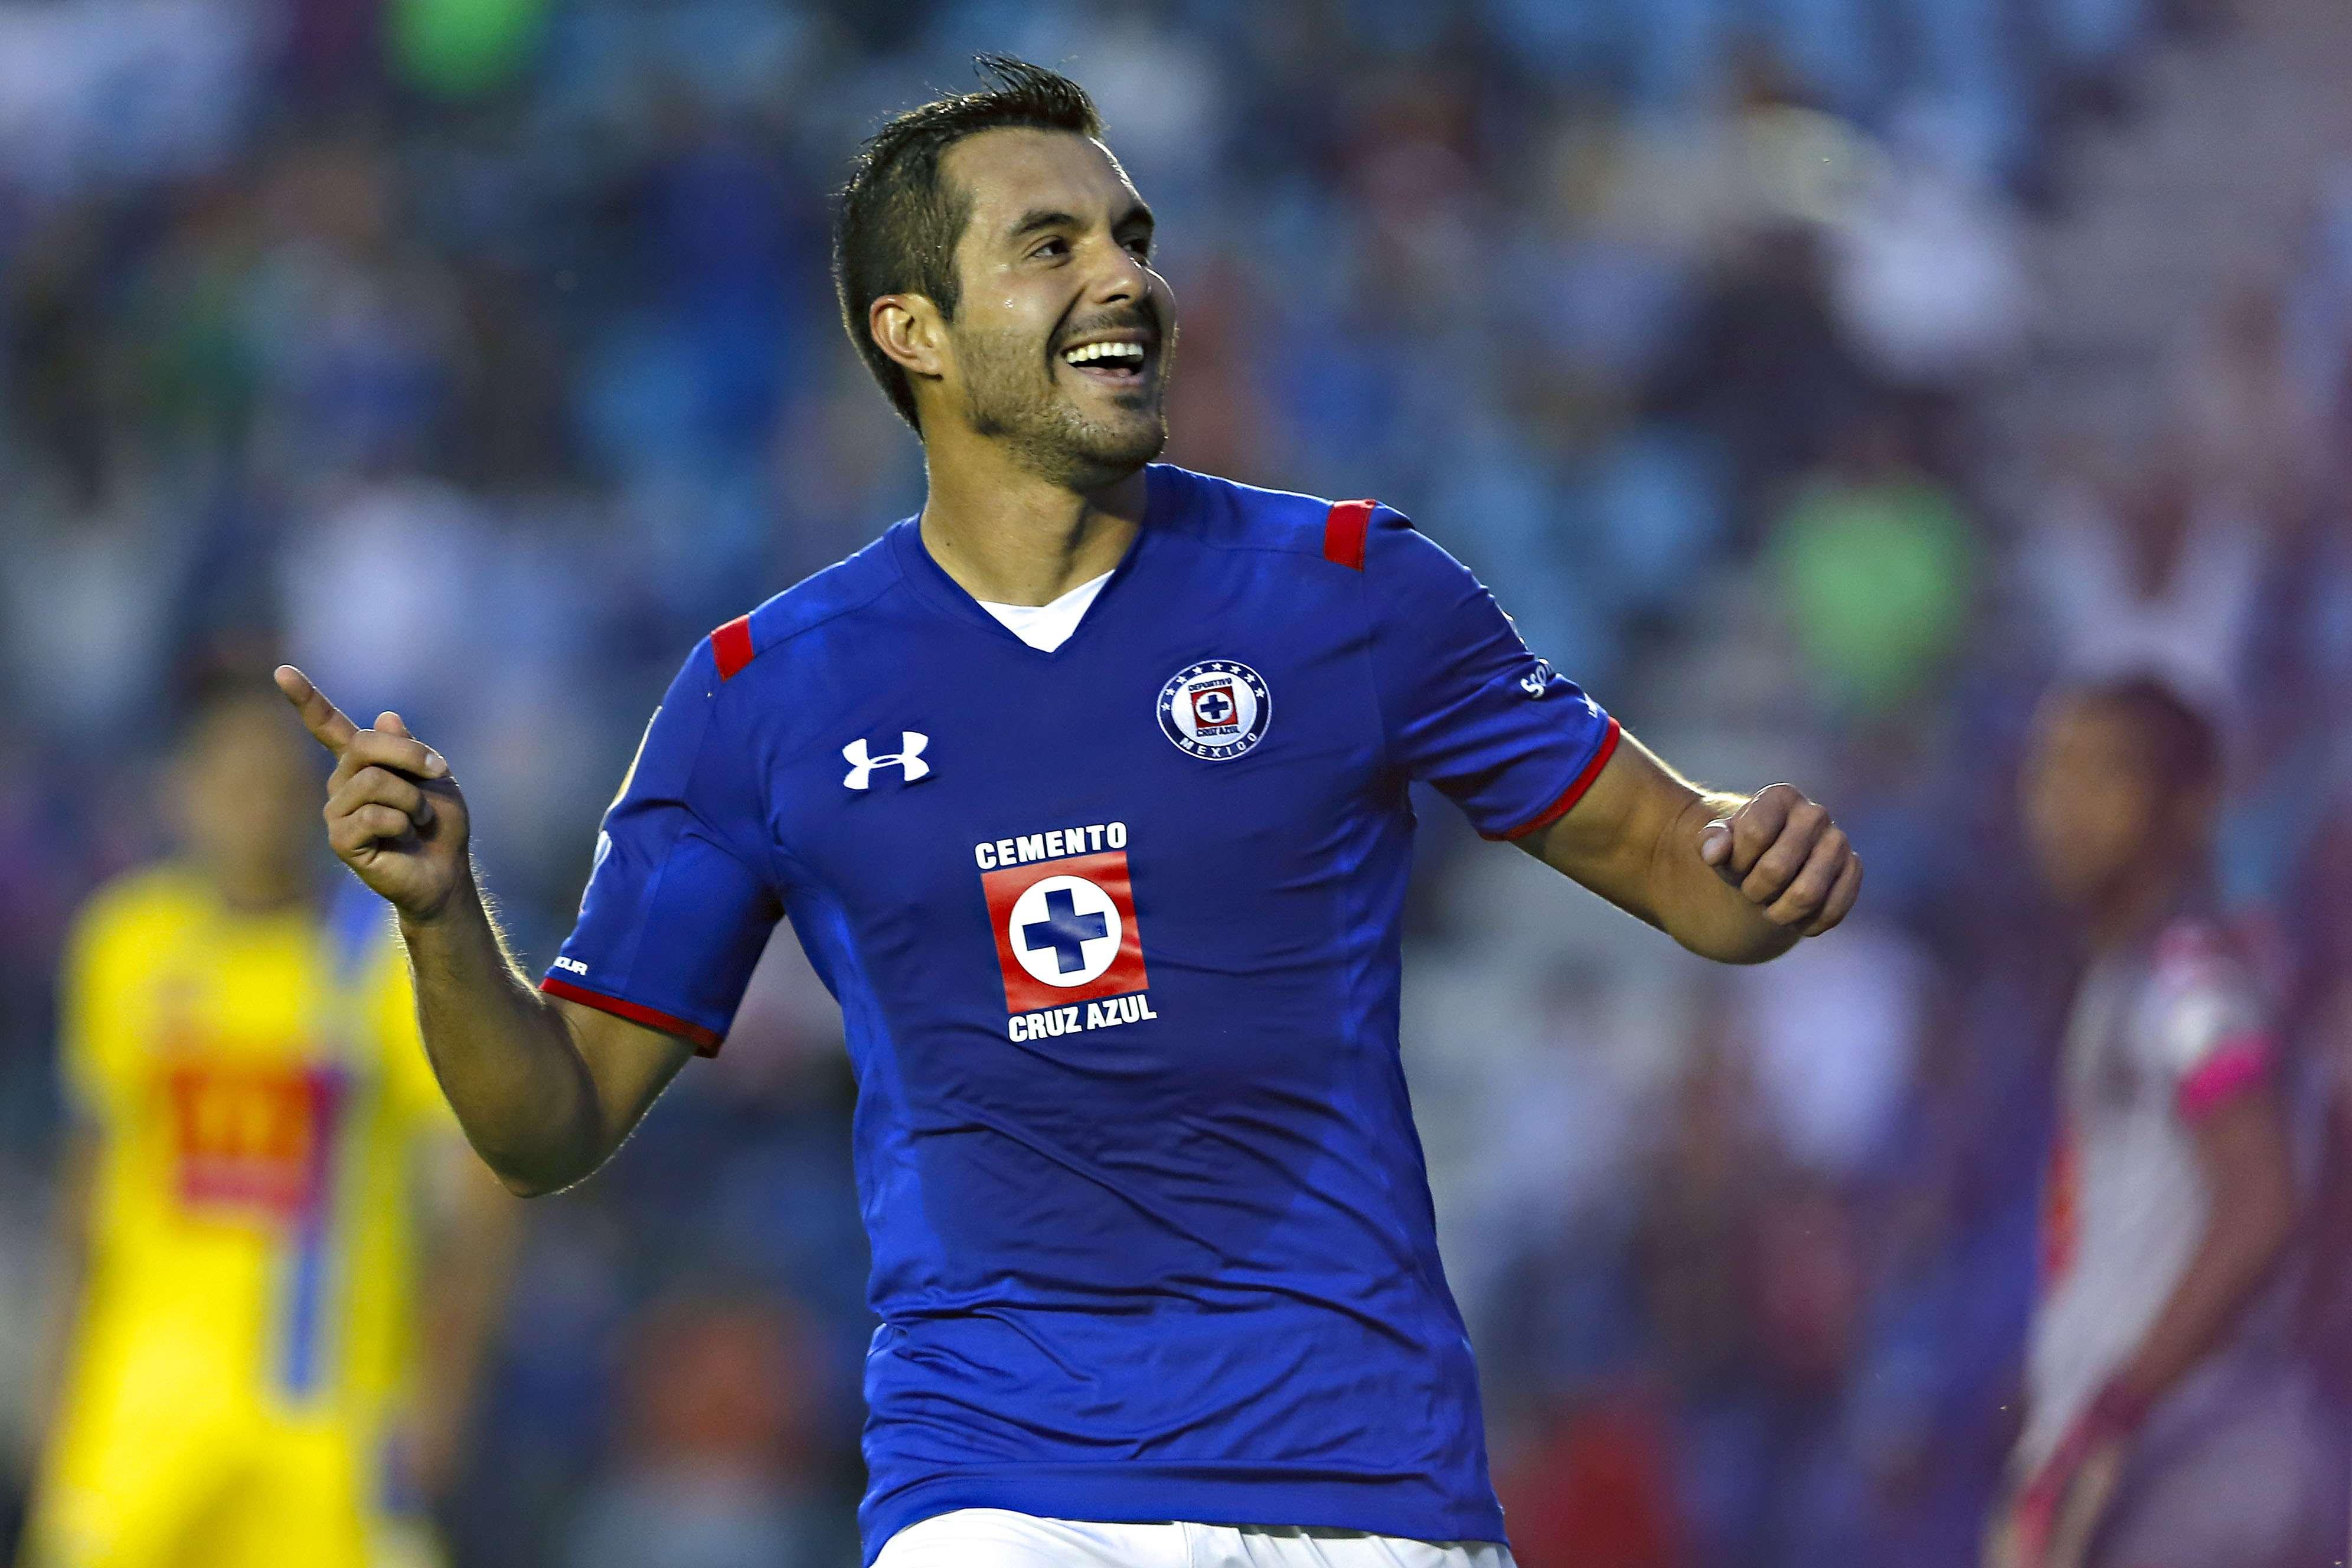 Ismael Valadez celebra el segundo gol de Cruz Azul, en el triunfo 3-0 sobre Chorrillo. Foto: Imago7